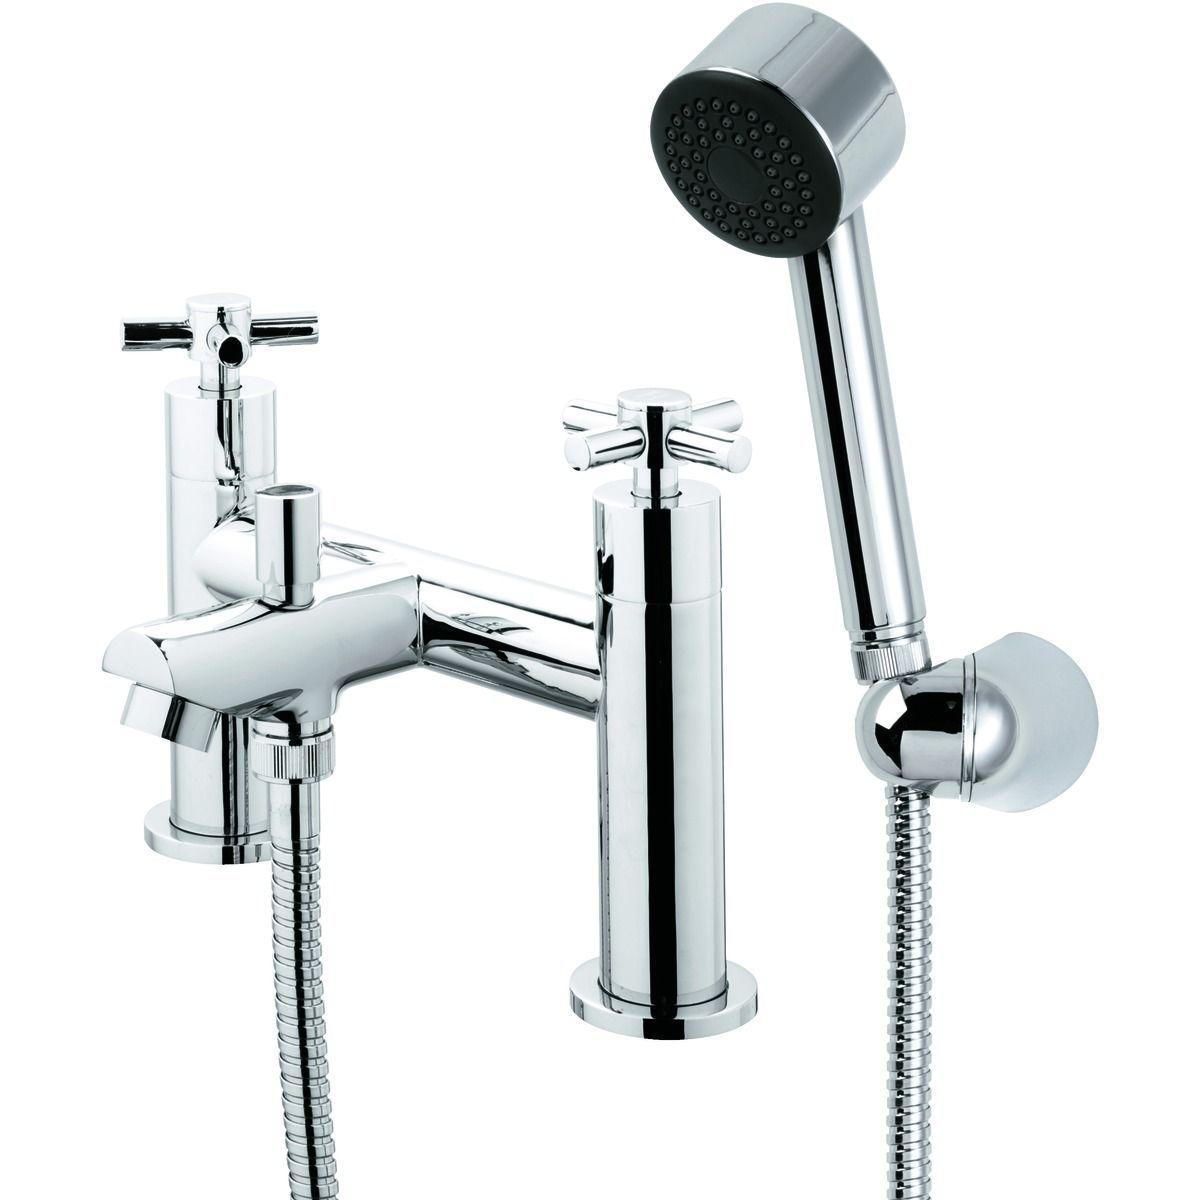 Wickes Trivor Bath Shower Mixer Chrome | Wickes.co.uk | New house ...